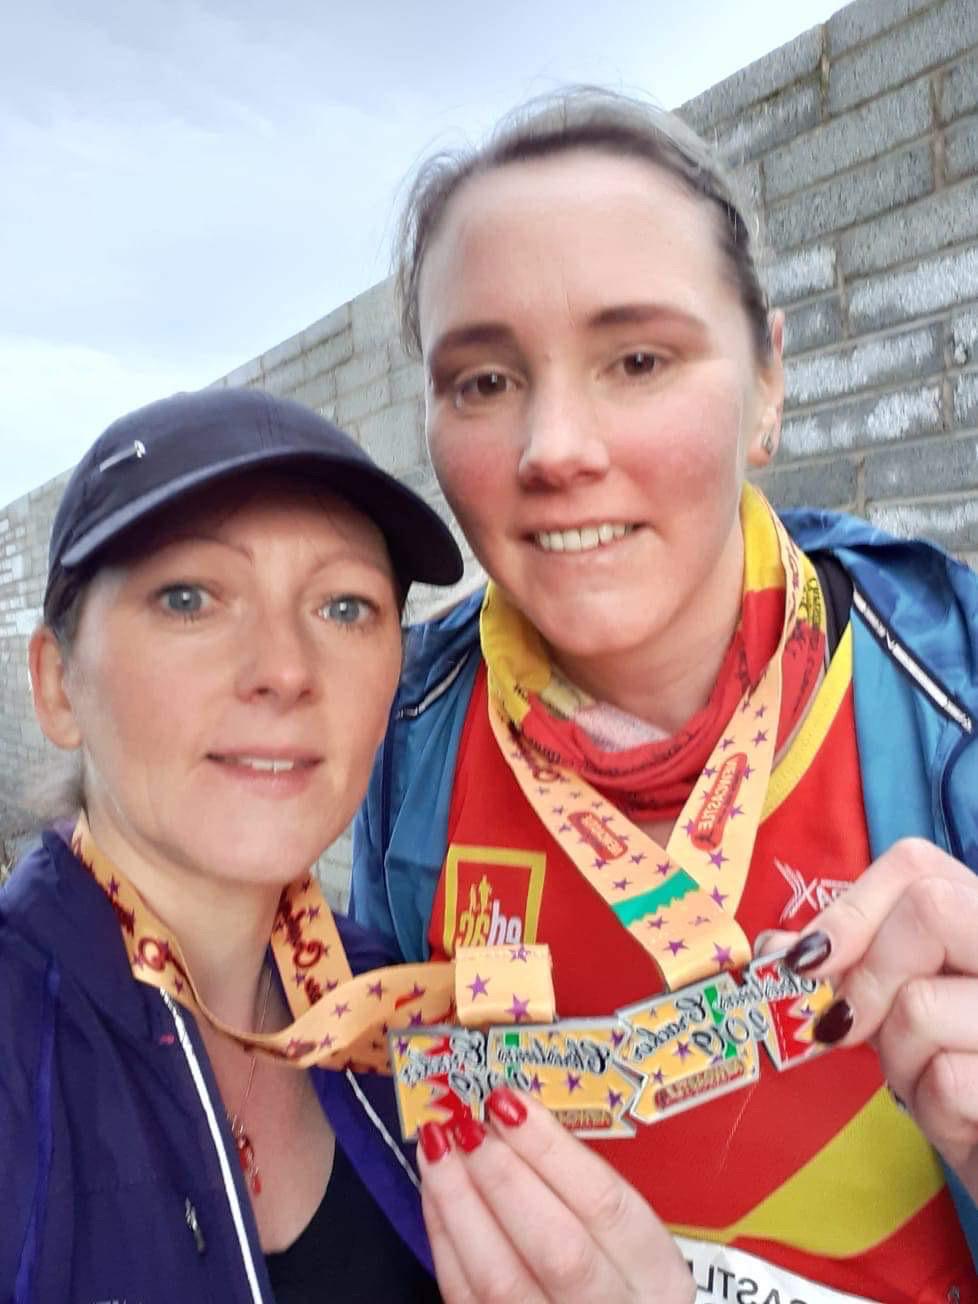 Oonagh Breteche and Janine Murray